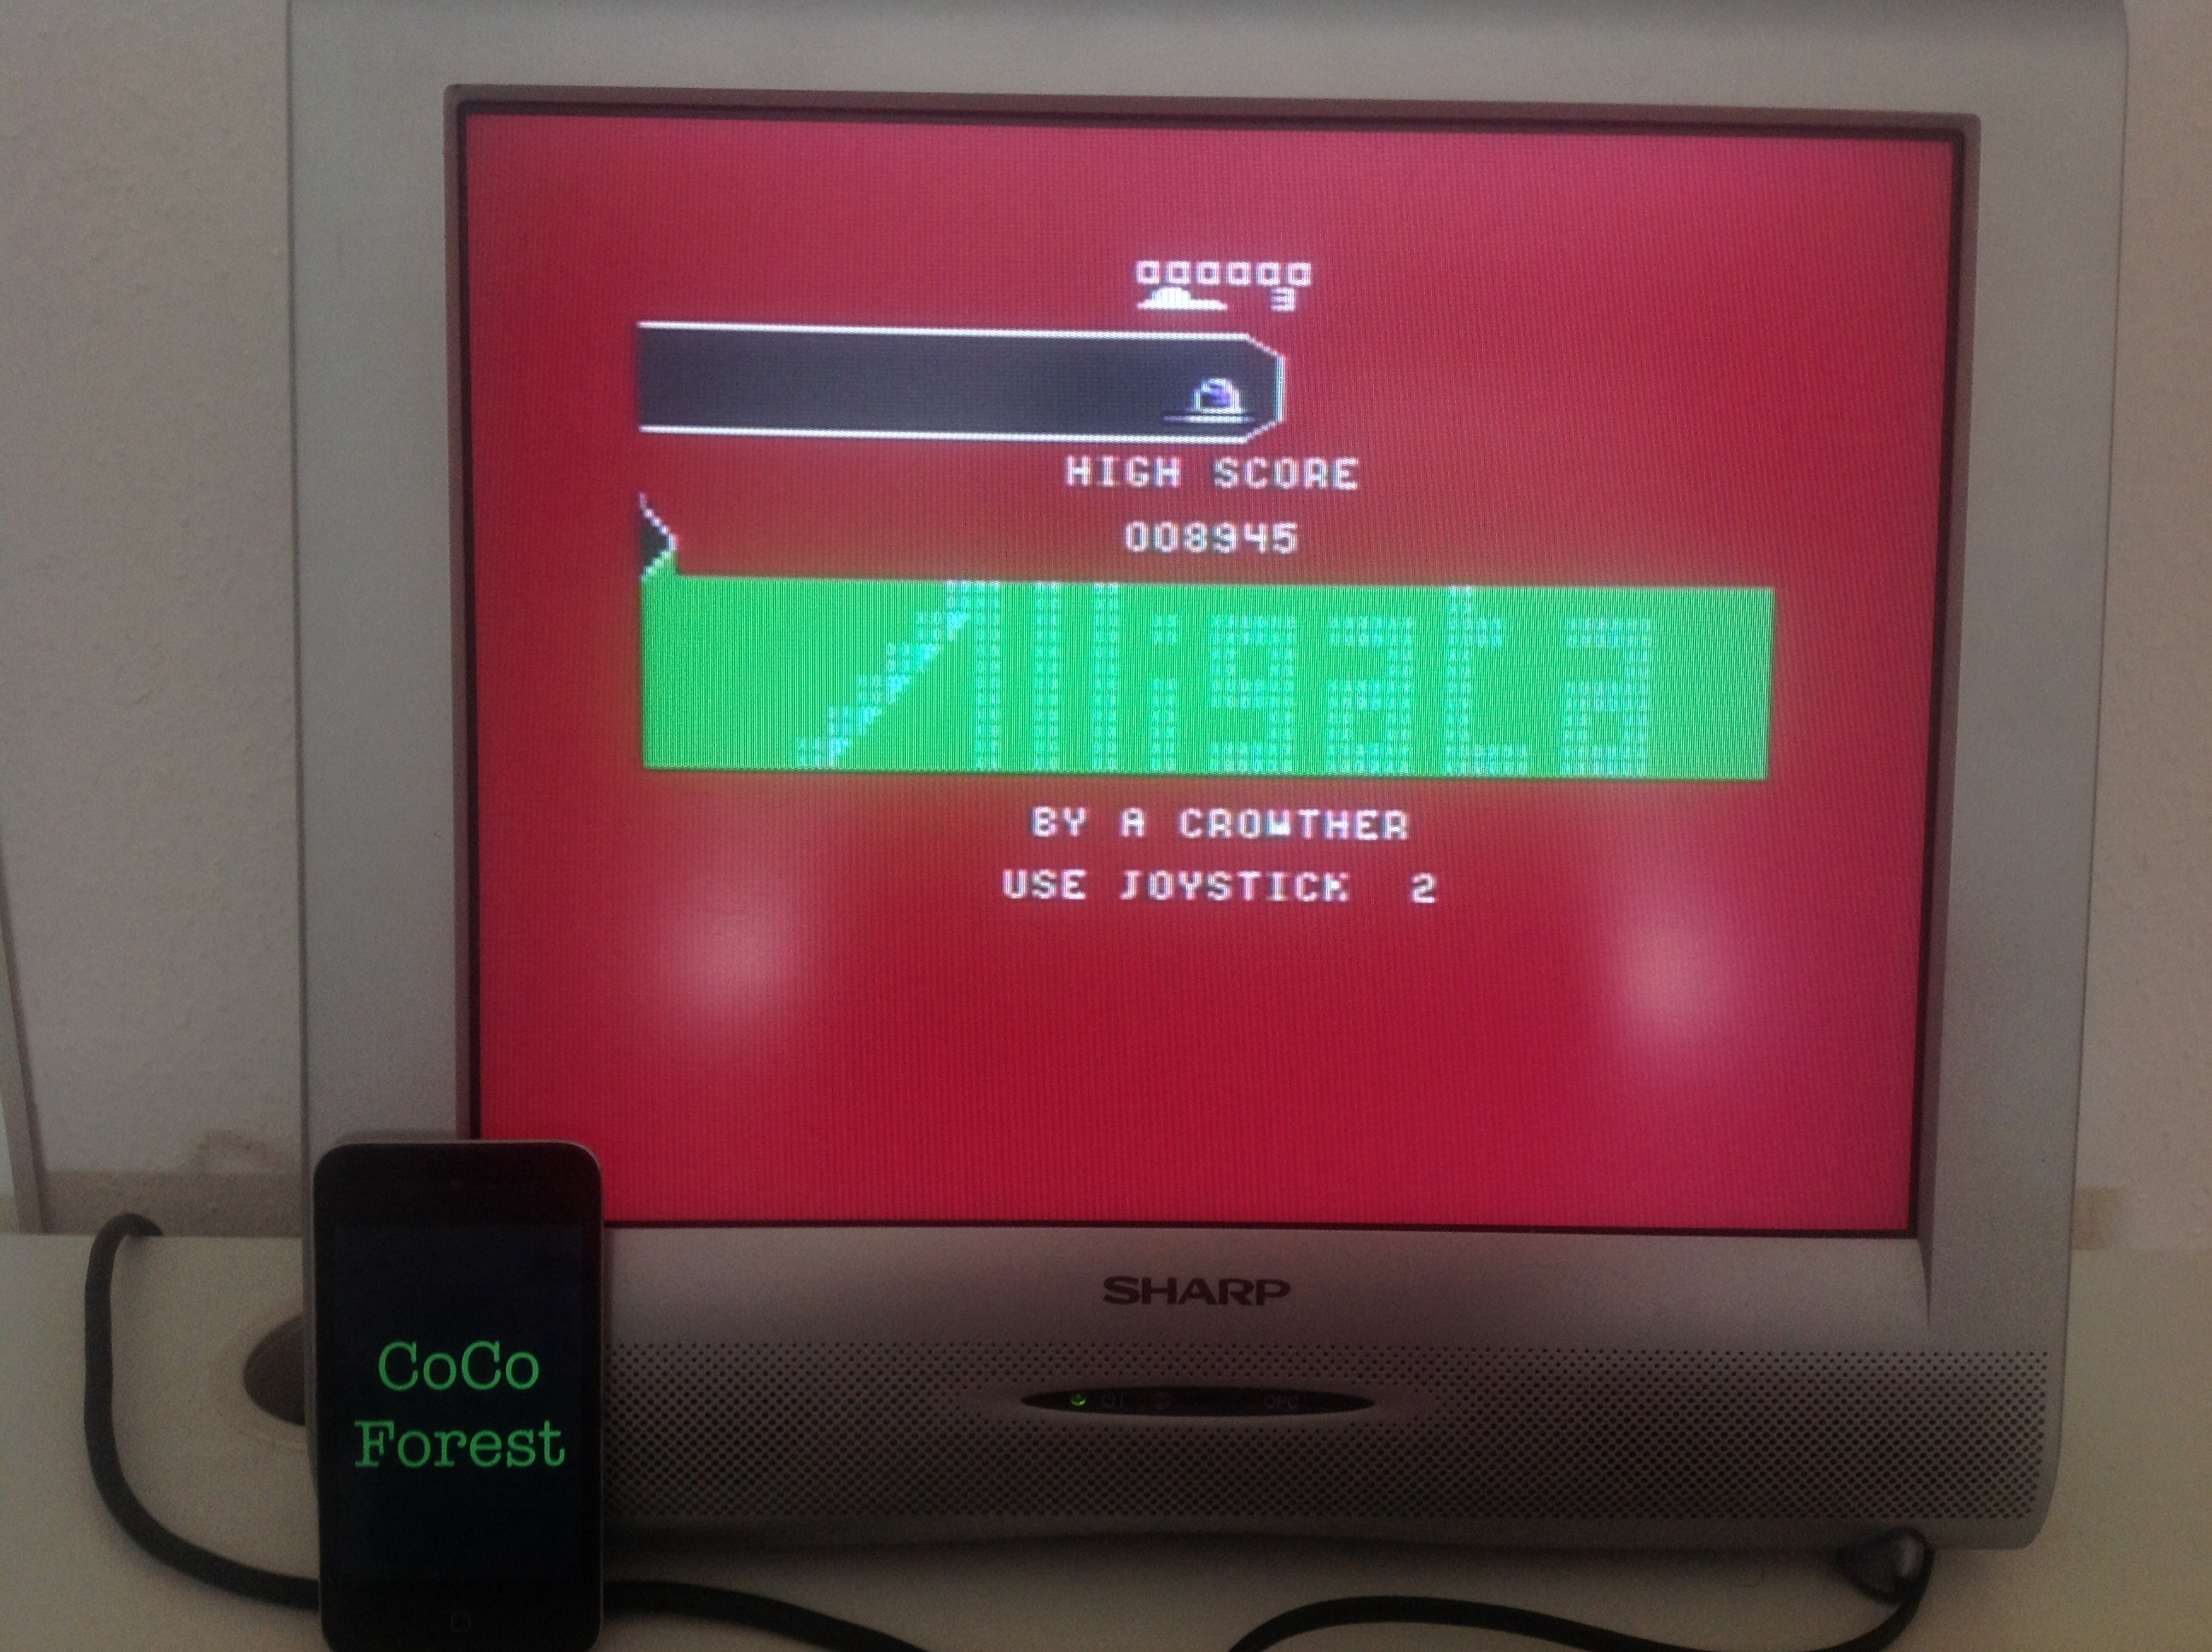 CoCoForest: Killerwatt: Level 1 Start (Commodore 64) 8,945 points on 2014-07-23 08:48:57